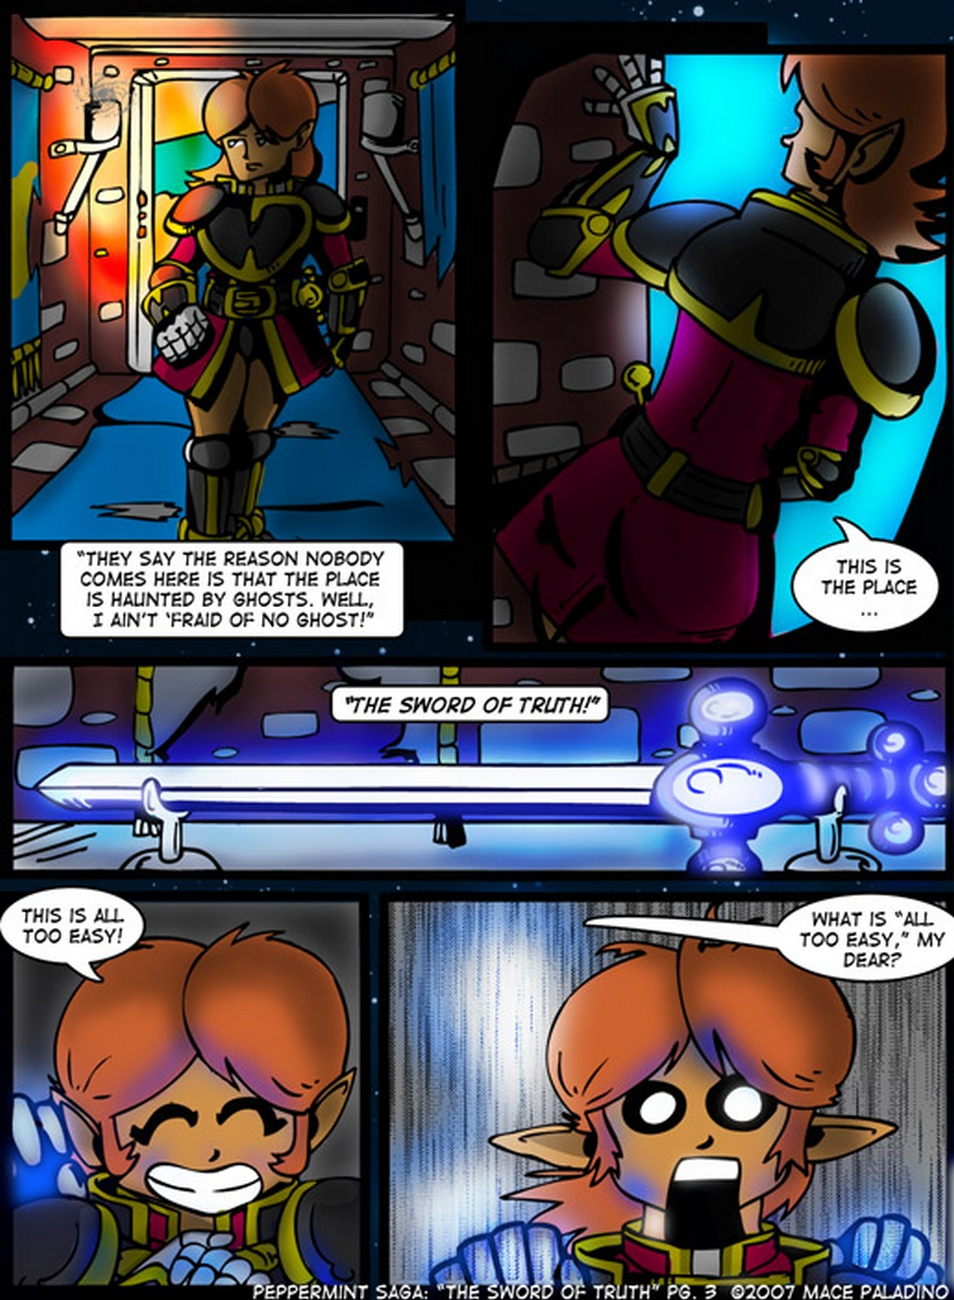 Peppermint-Saga-1-The-Sword-Of-Truth 5 free sex comic